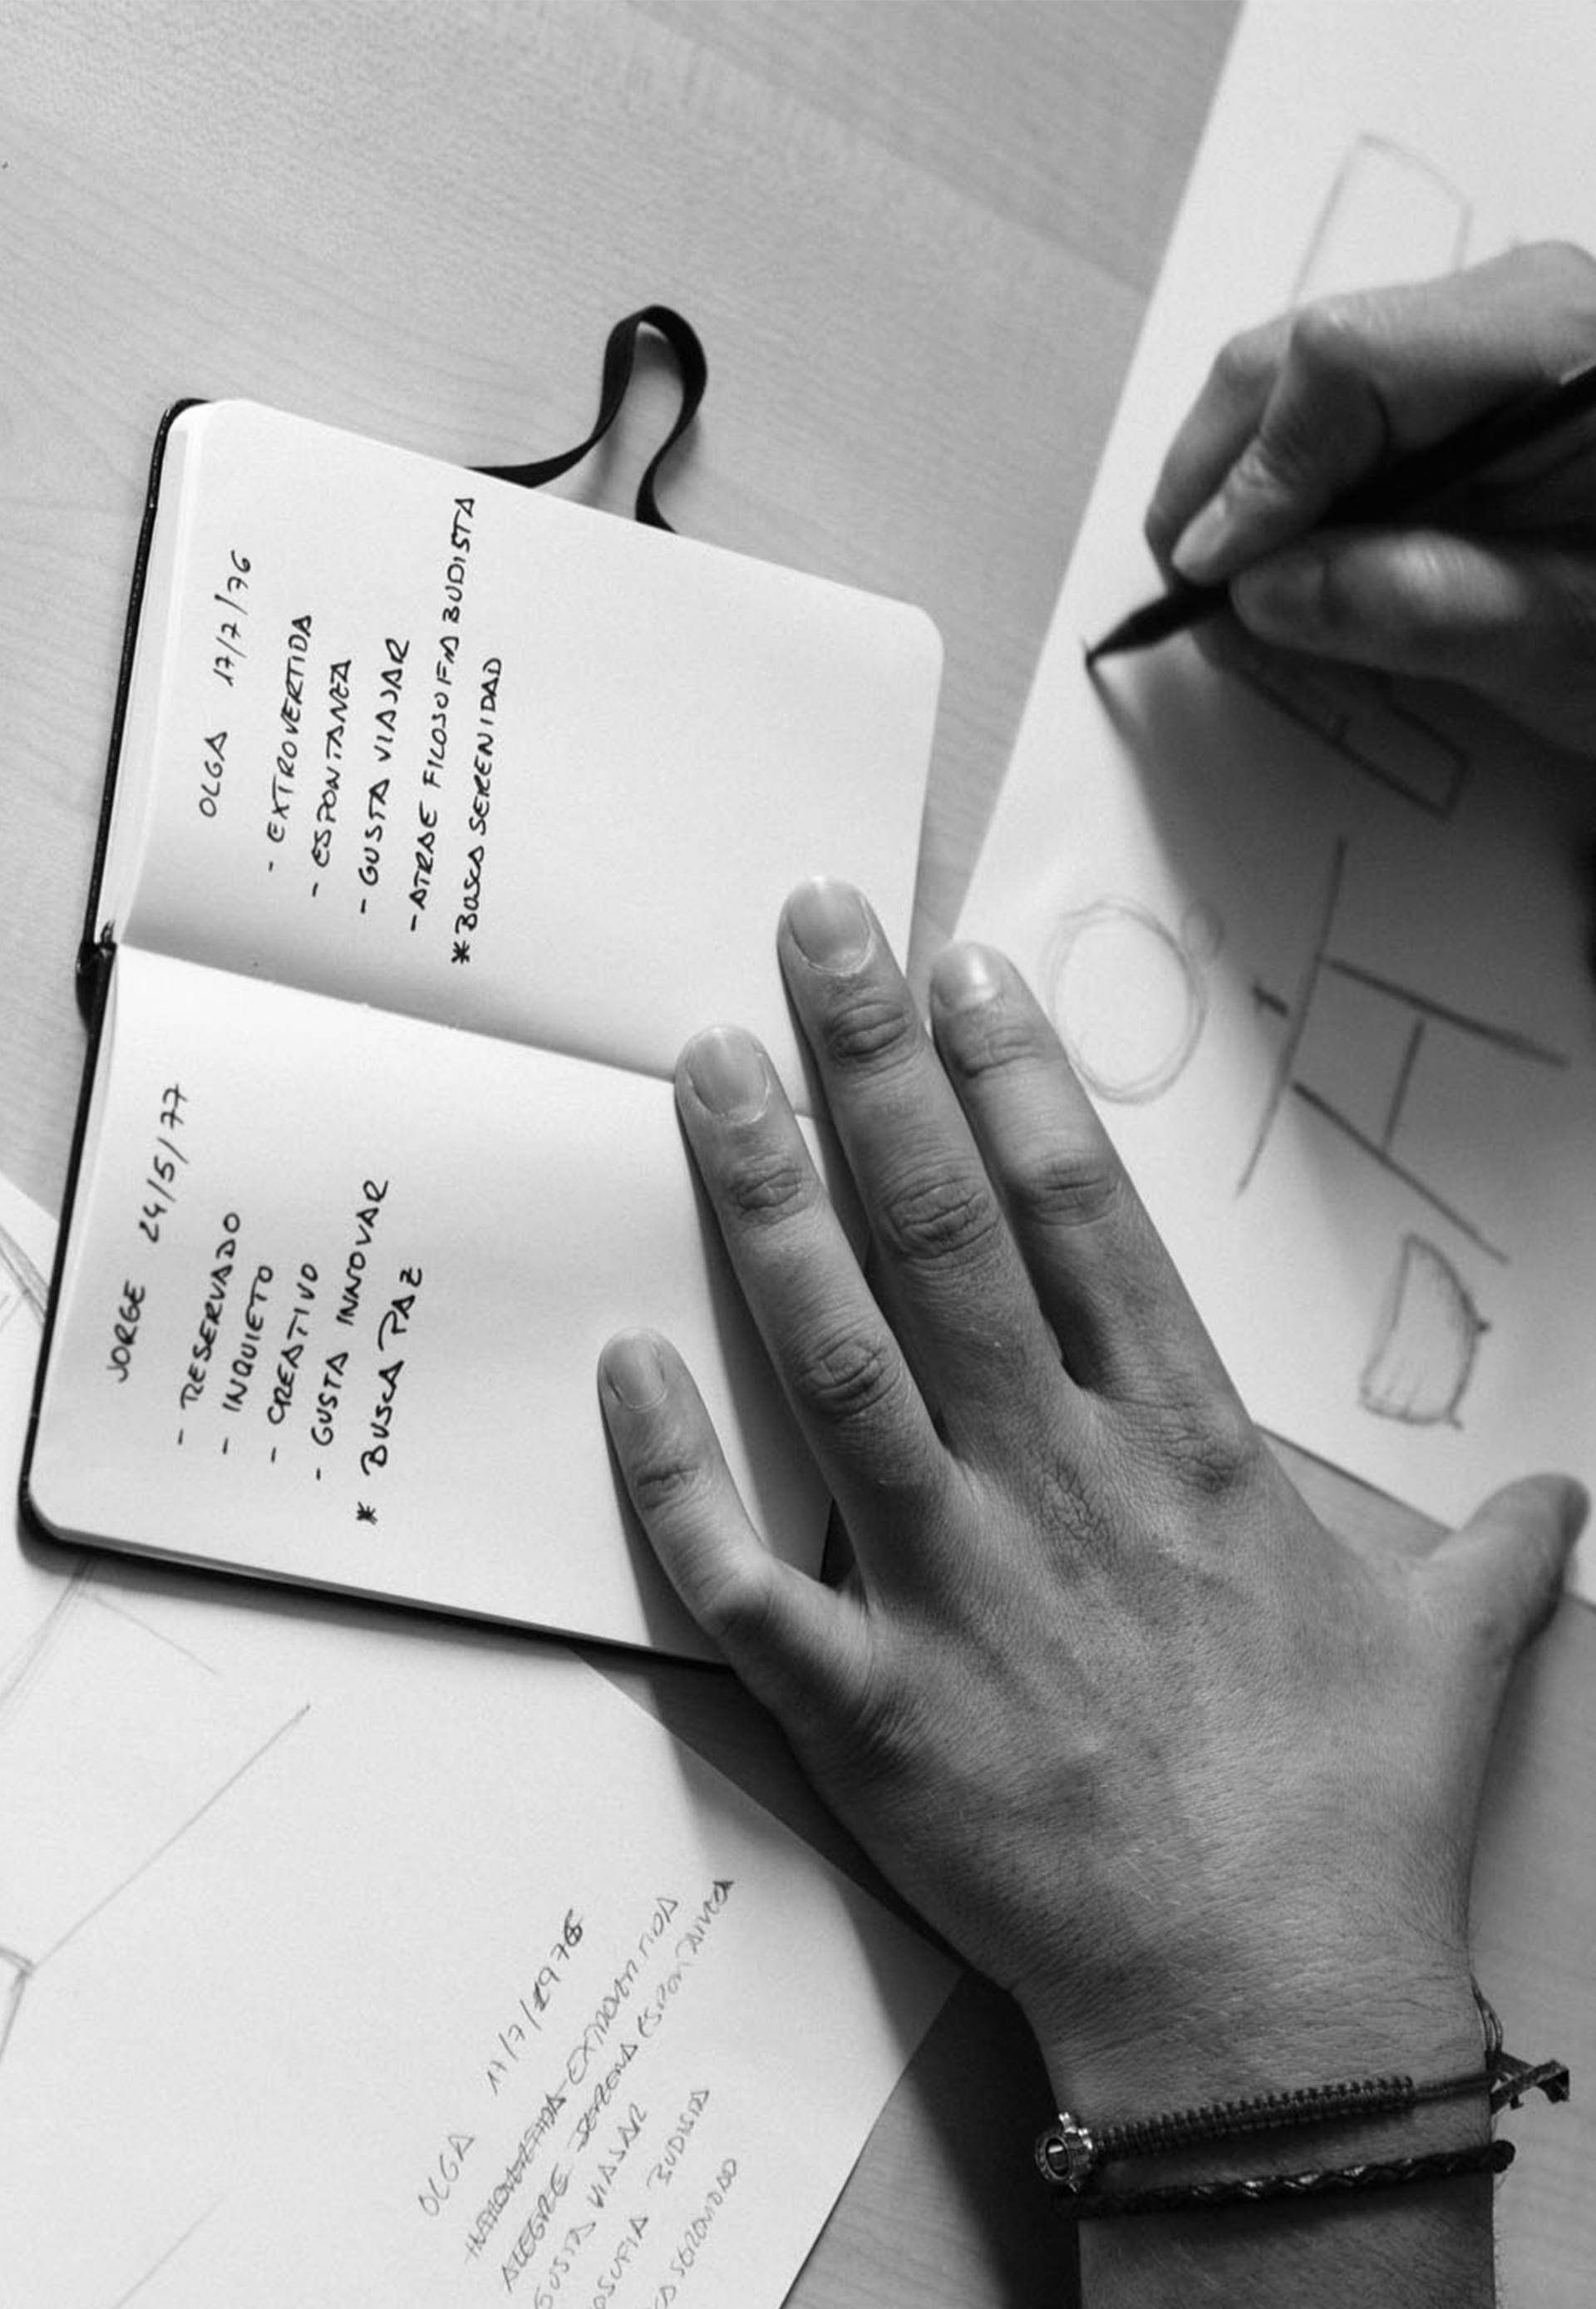 asesoramiento-interiorismo-interiorista-diseno-interiores-formacion-talleres